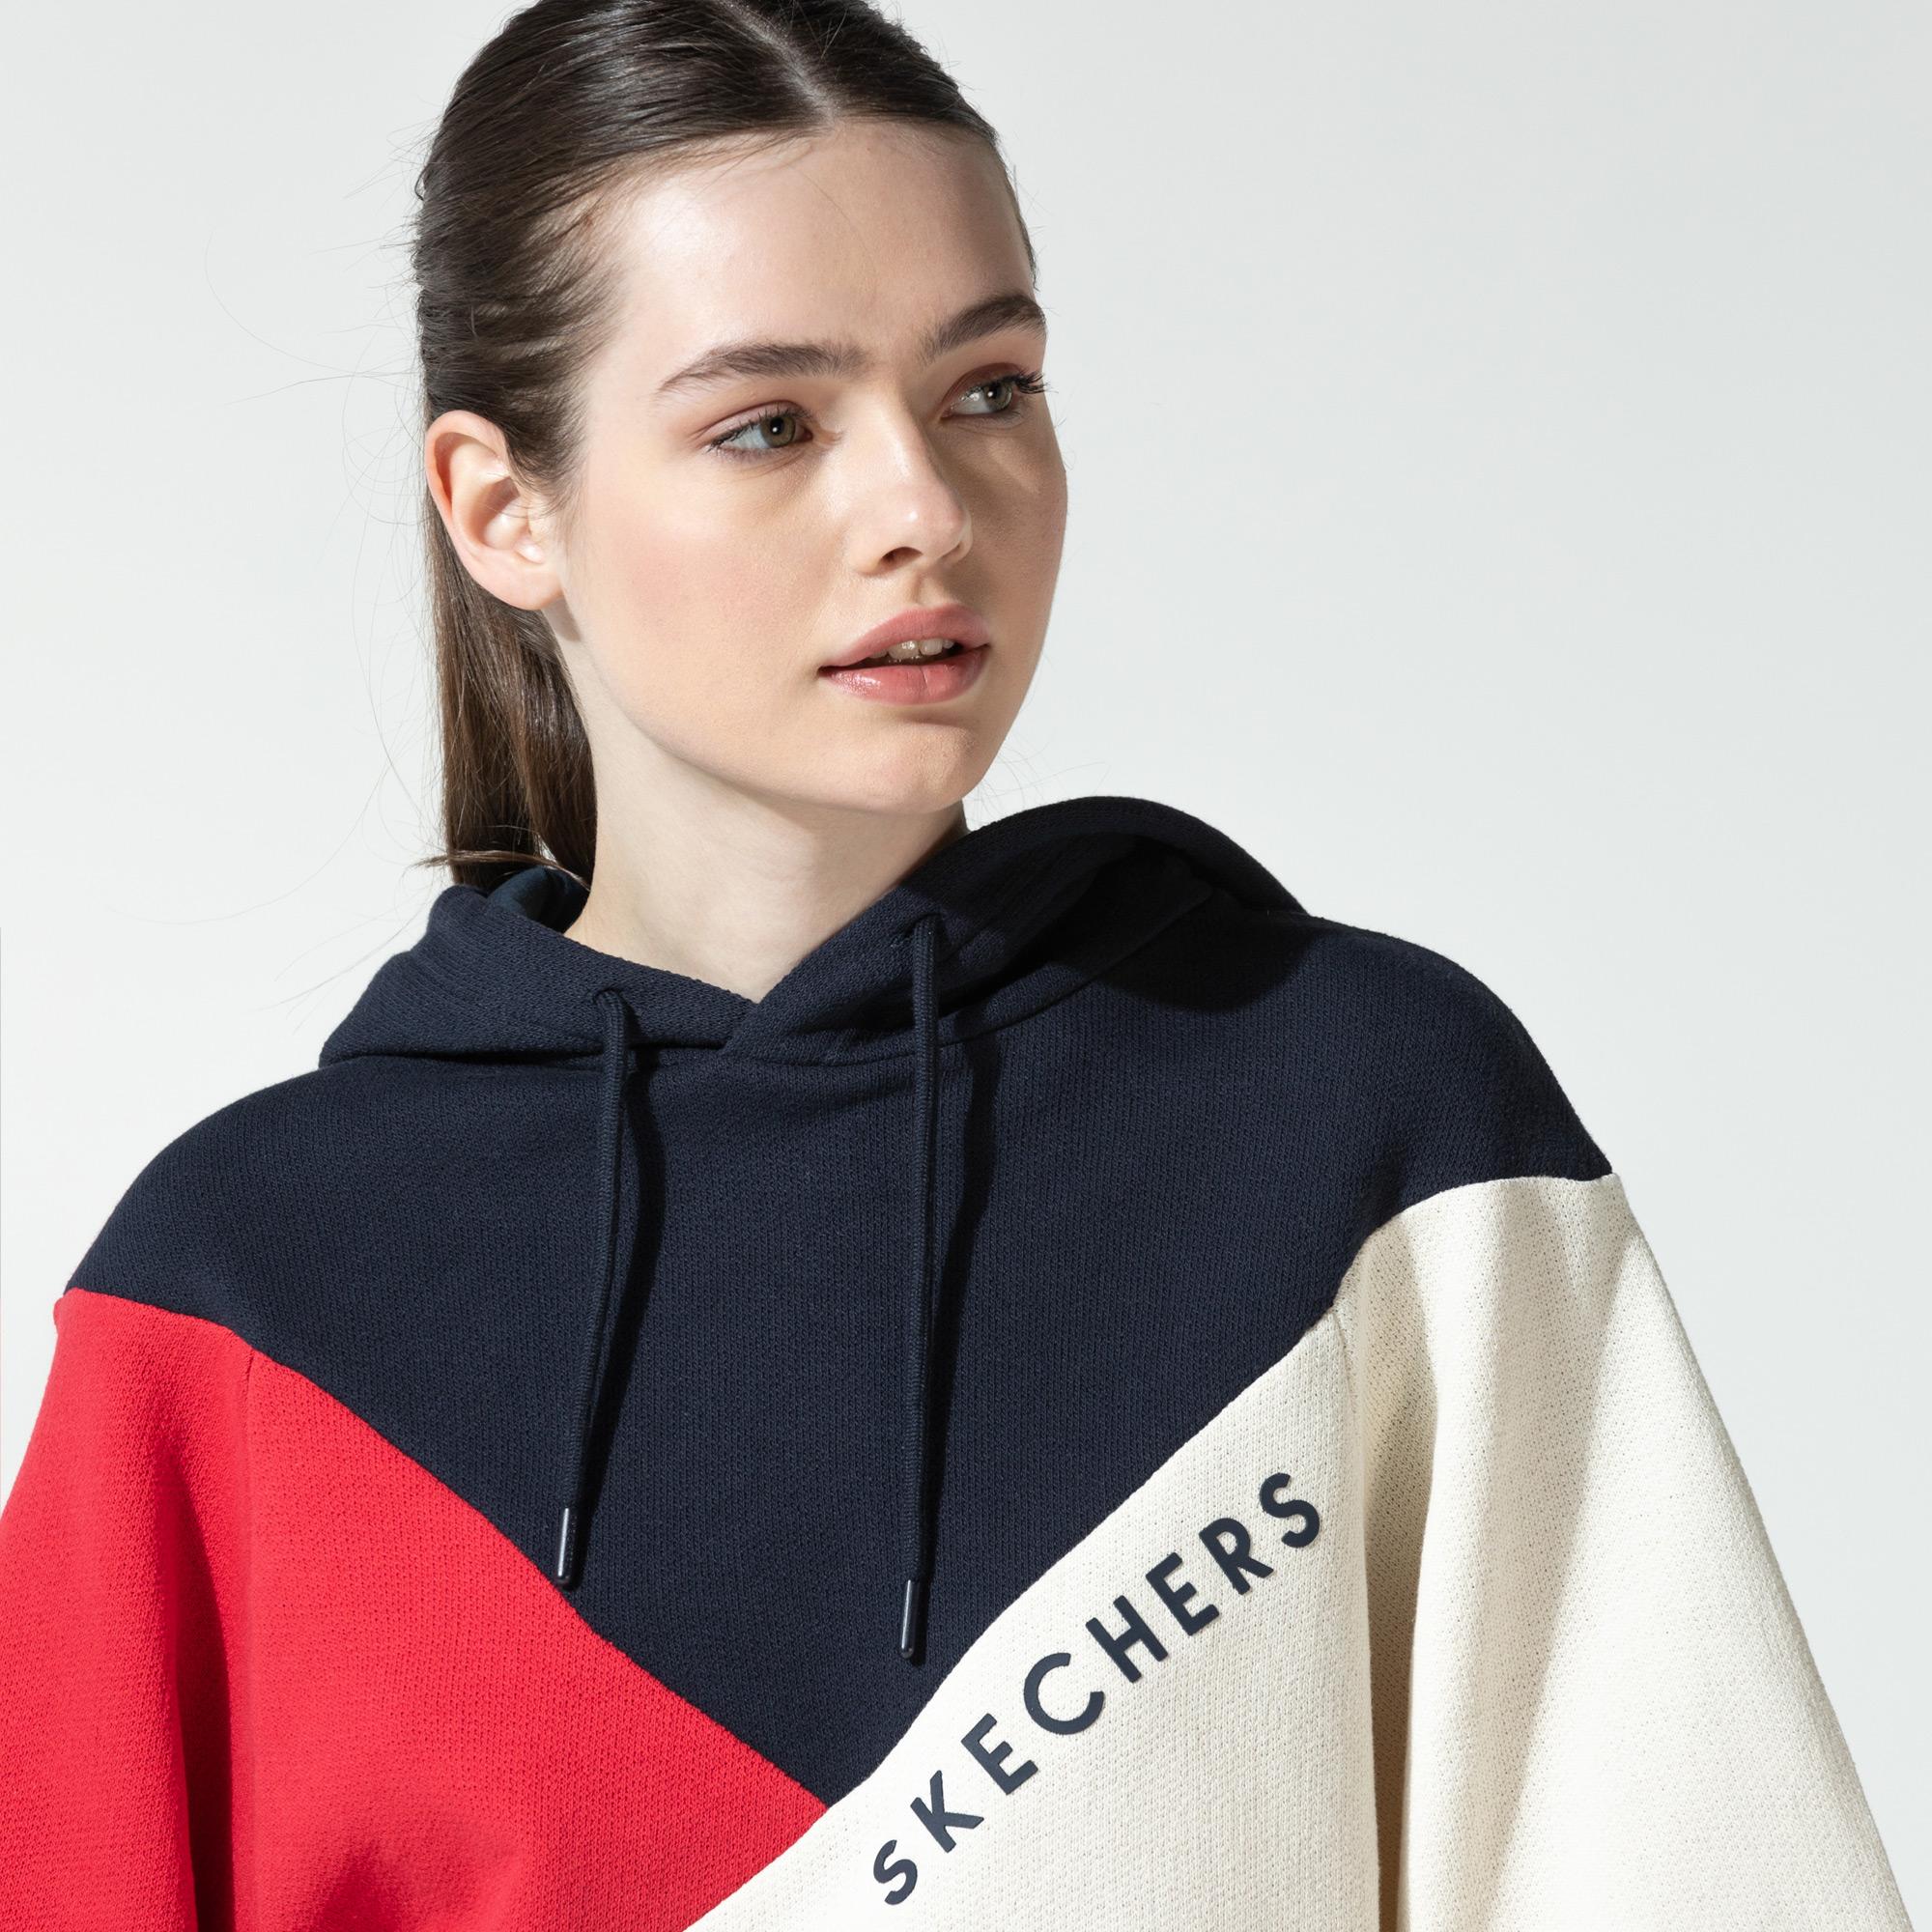 Skechers Fleece Kadın Renkli Sweatshirt